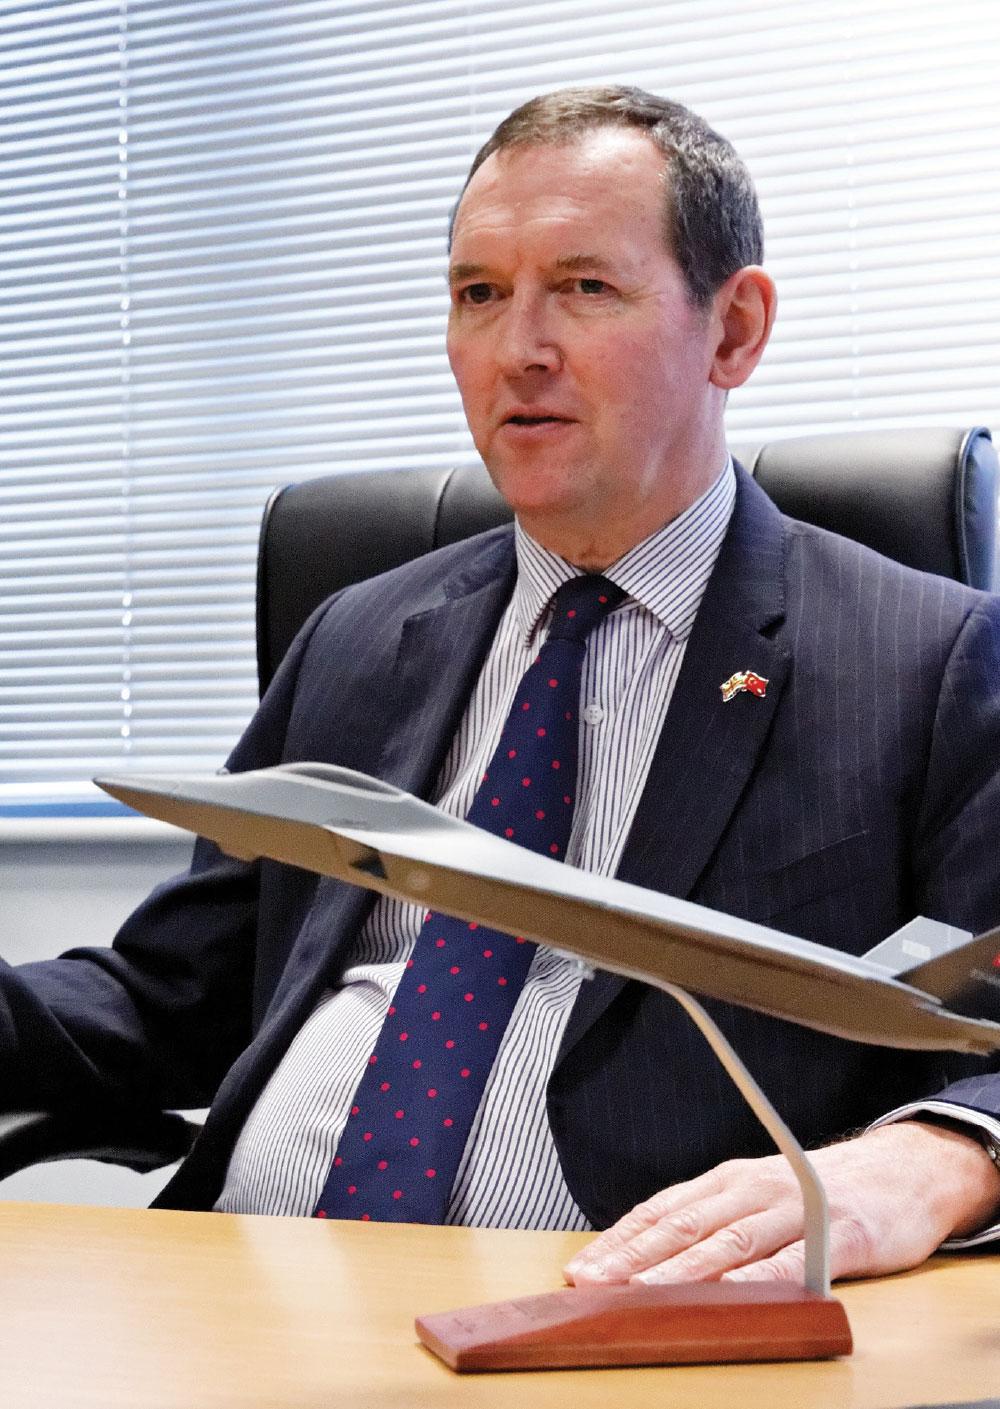 Leonardo: Reduce TF-X Avionics Cost Risks Through Partnership